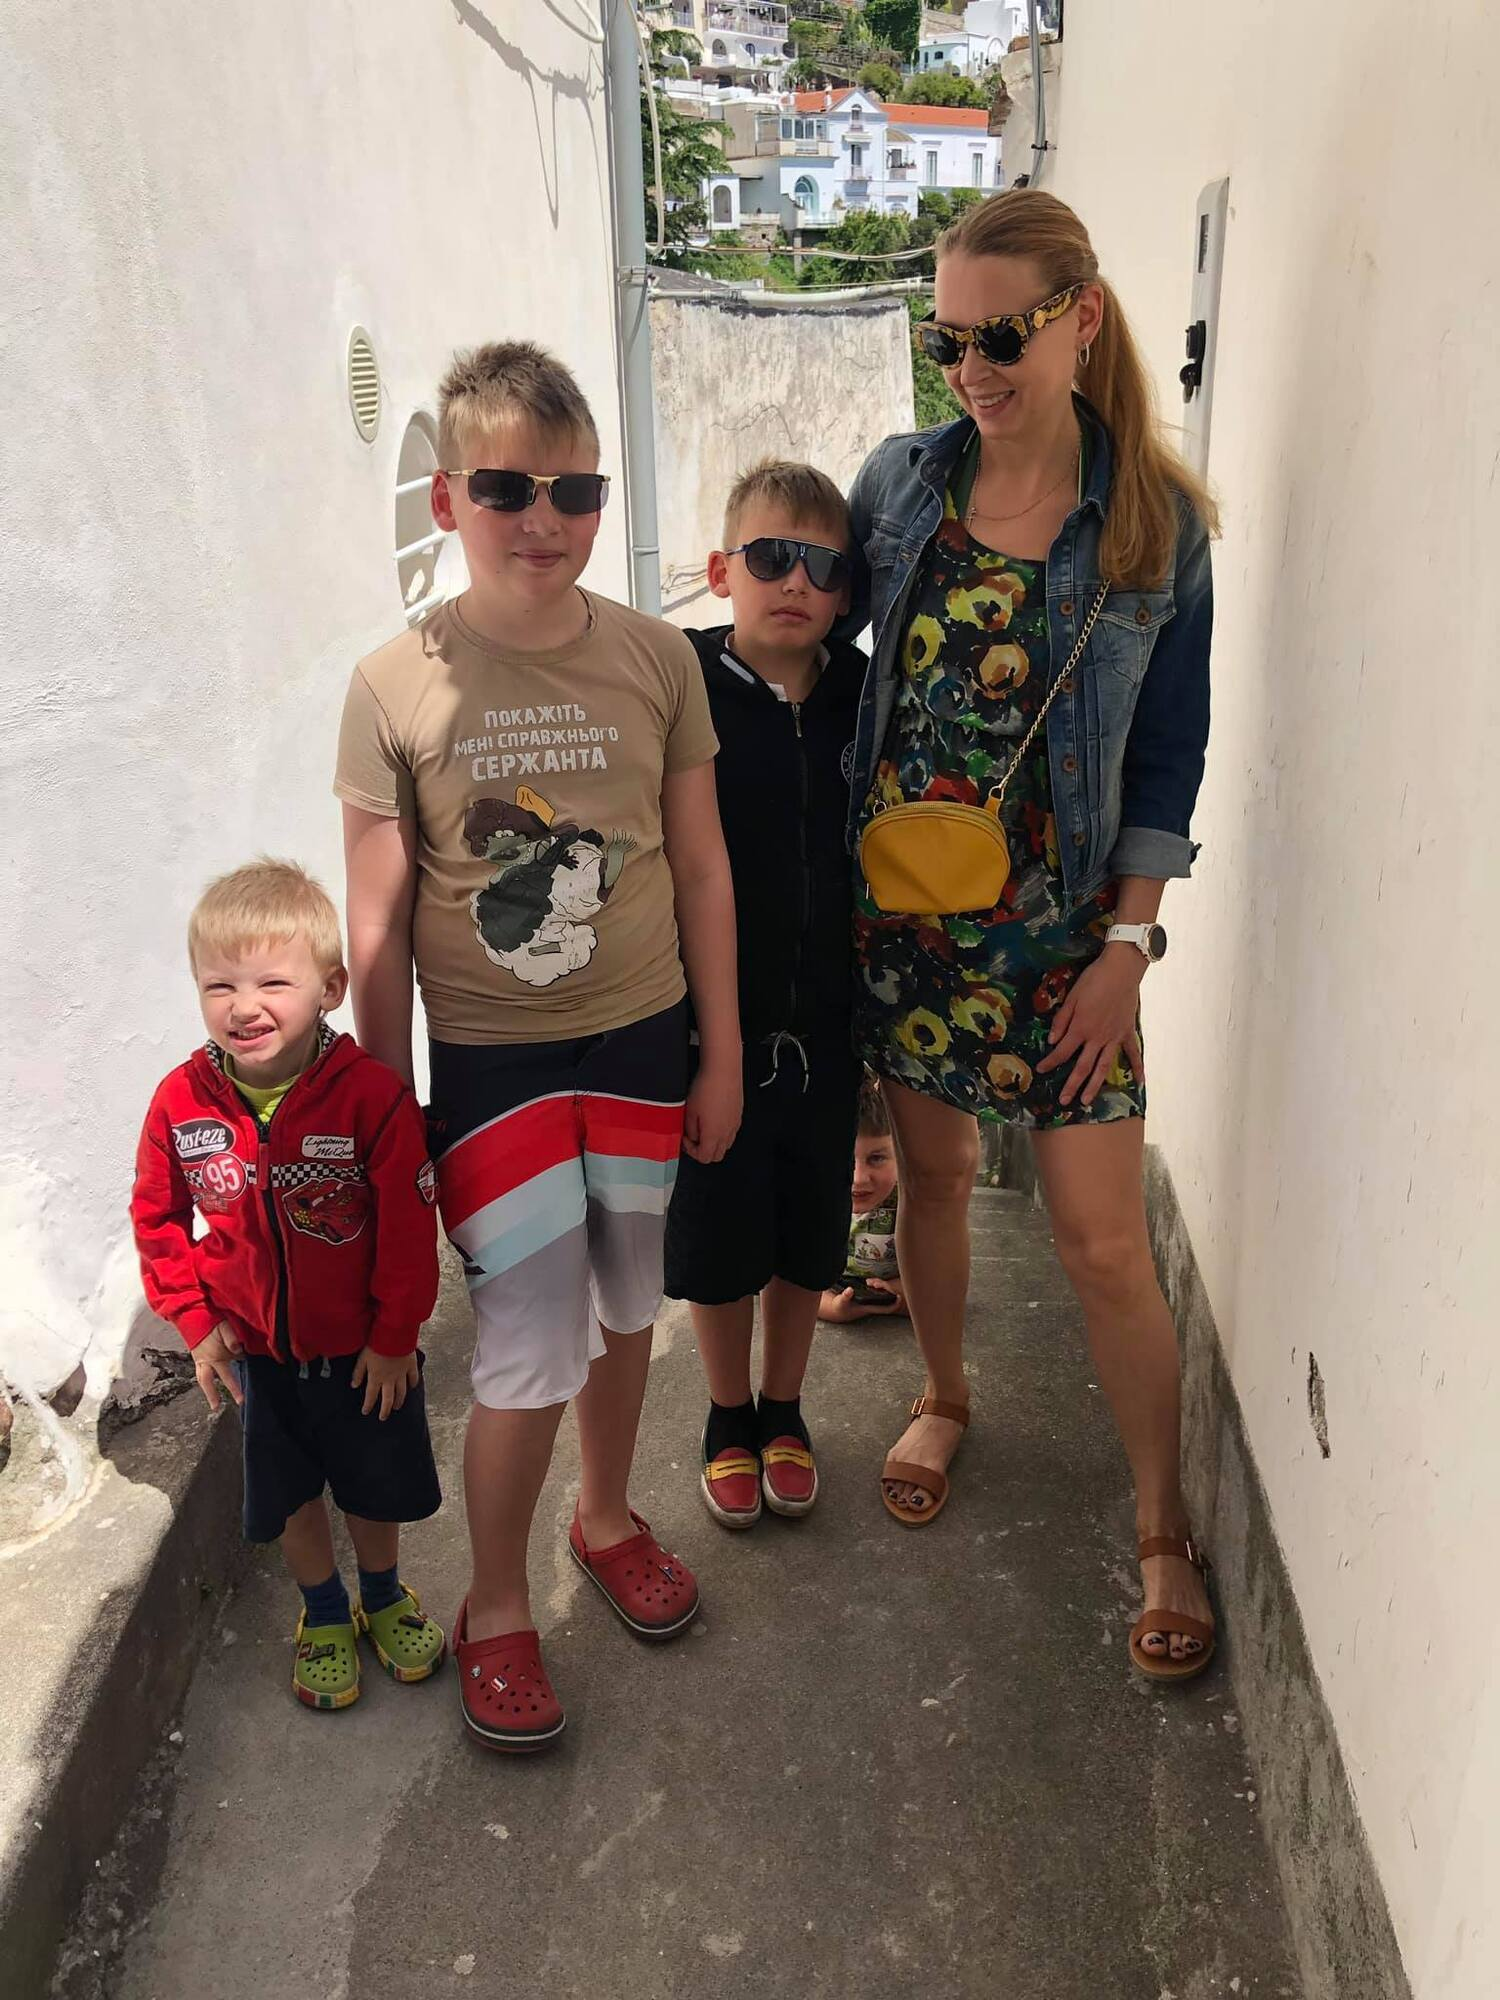 Зоряна Богдан с семьей